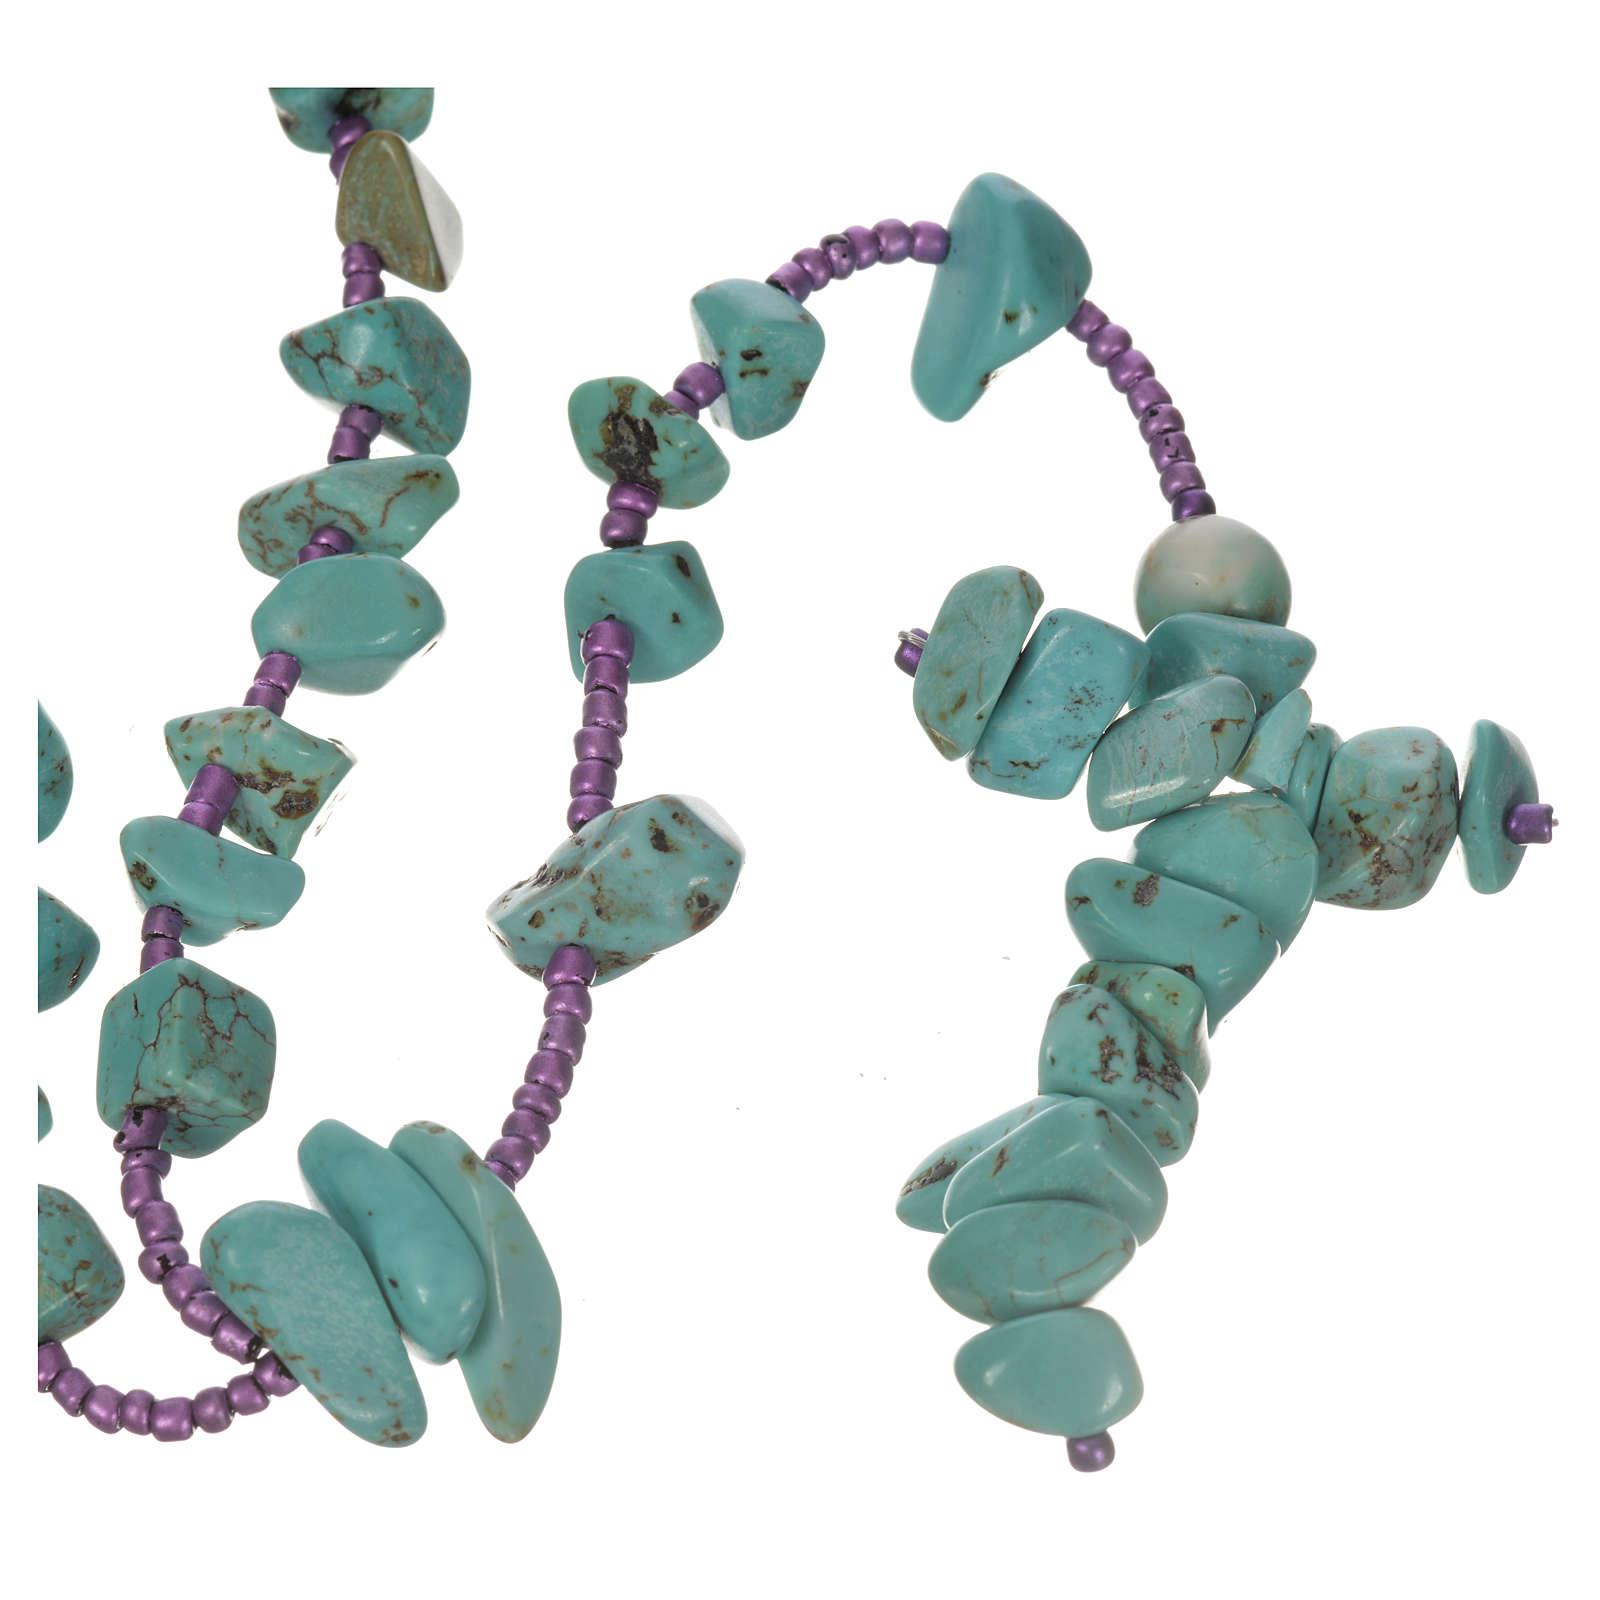 Medjugorje rosary beads in aqua green hard stones 4